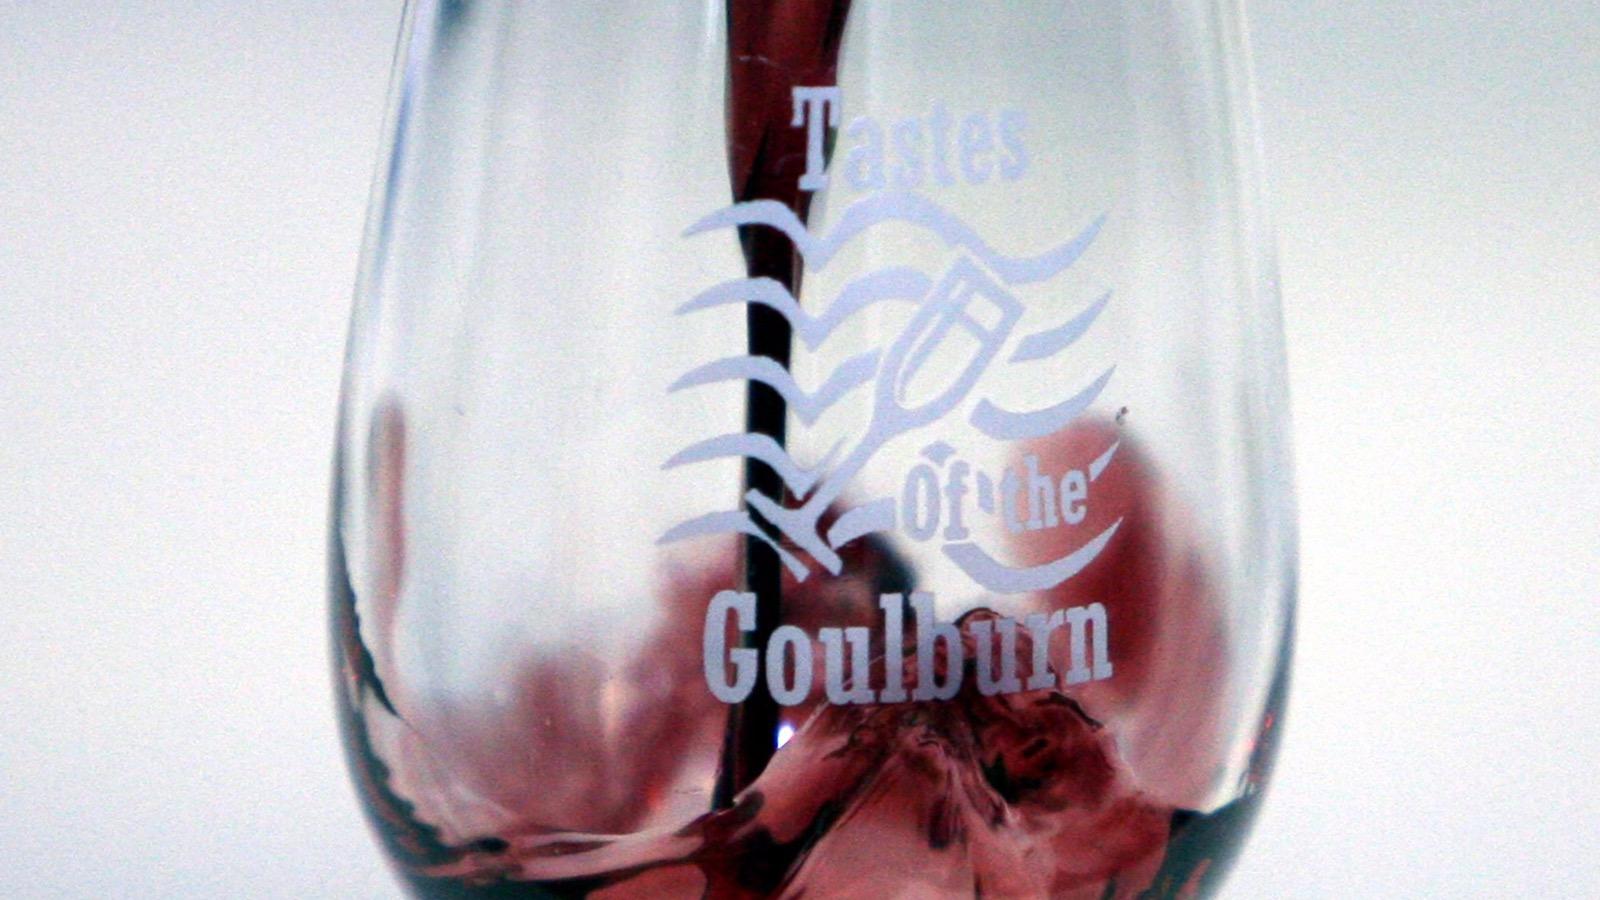 Tastes of the Goulburn wine glass